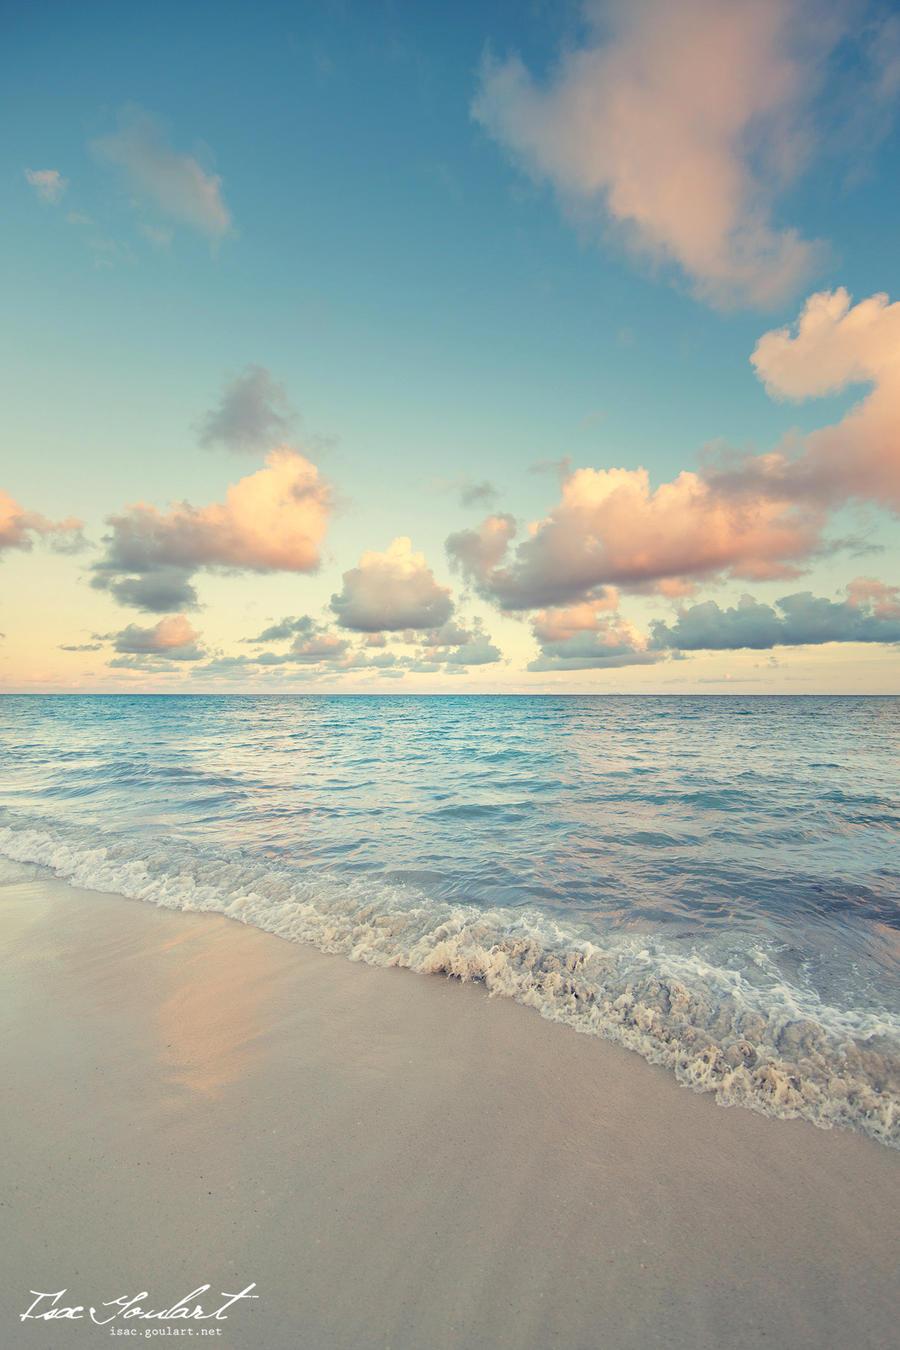 Playa del Carmen by IsacGoulart